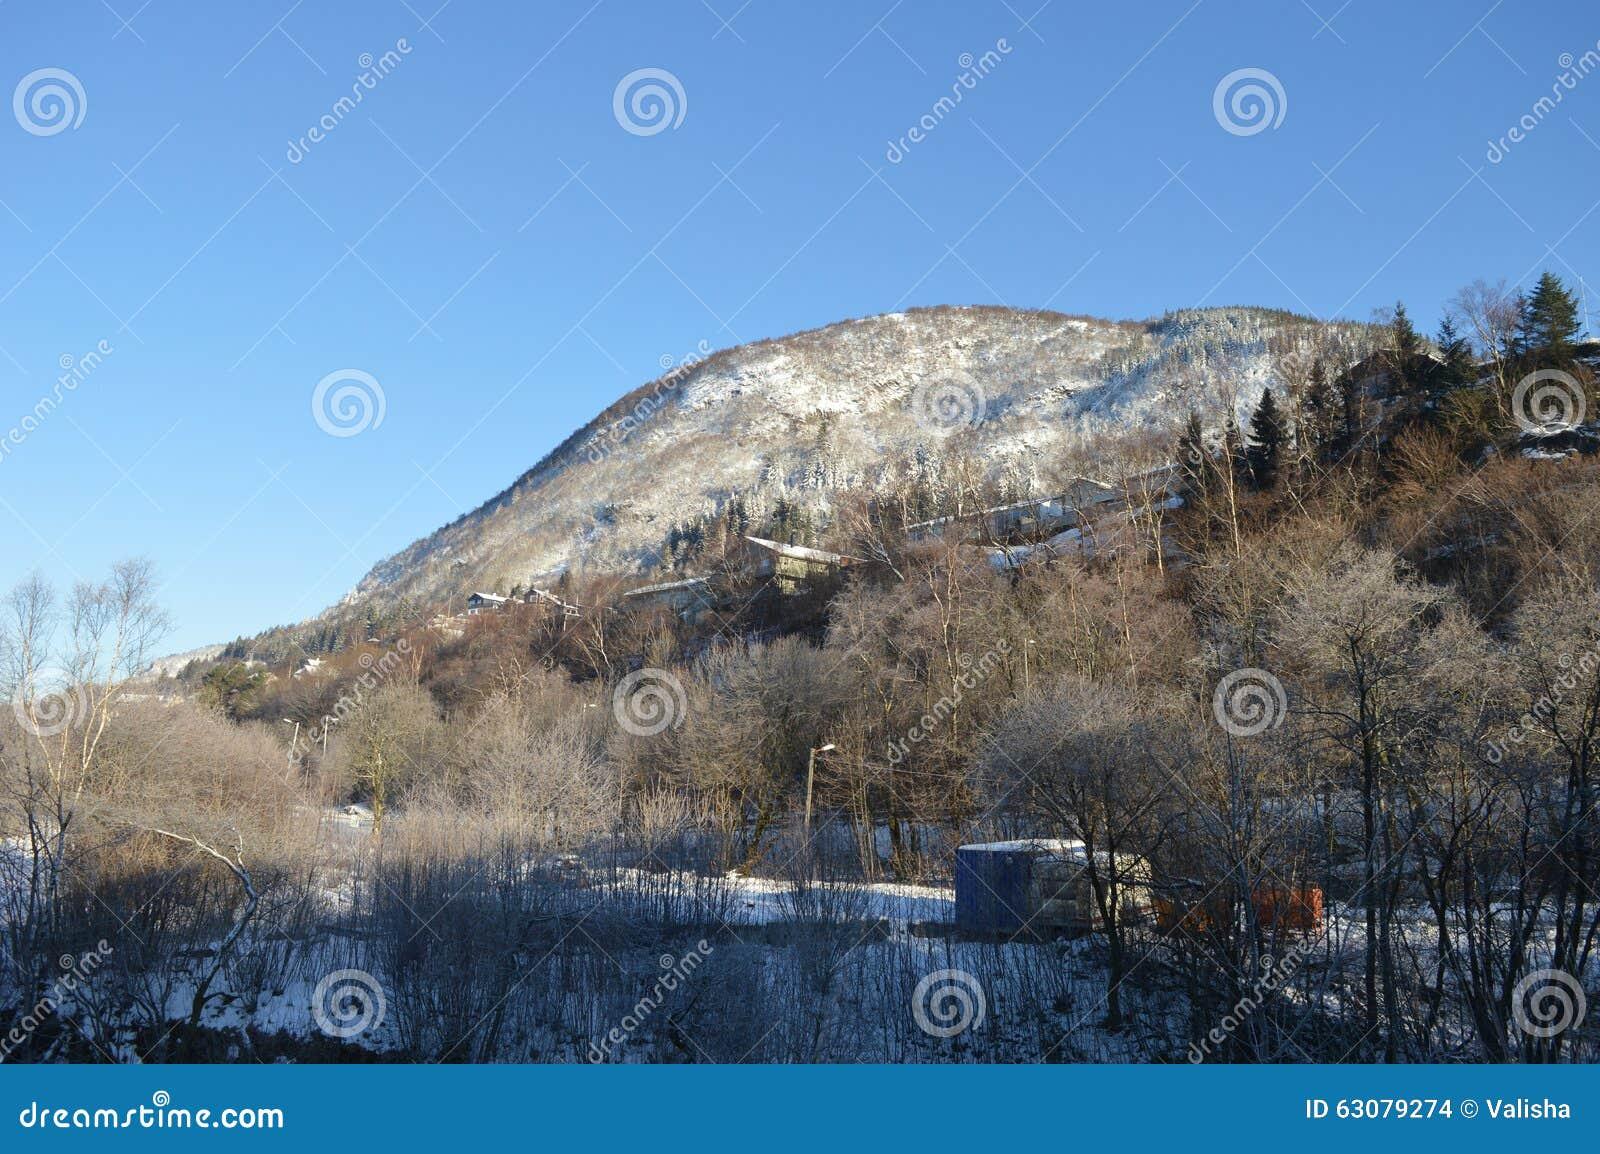 Download La Montagne Arnanipa Dans Arnatveit Norvège Photo stock - Image du montagne, d0: 63079274